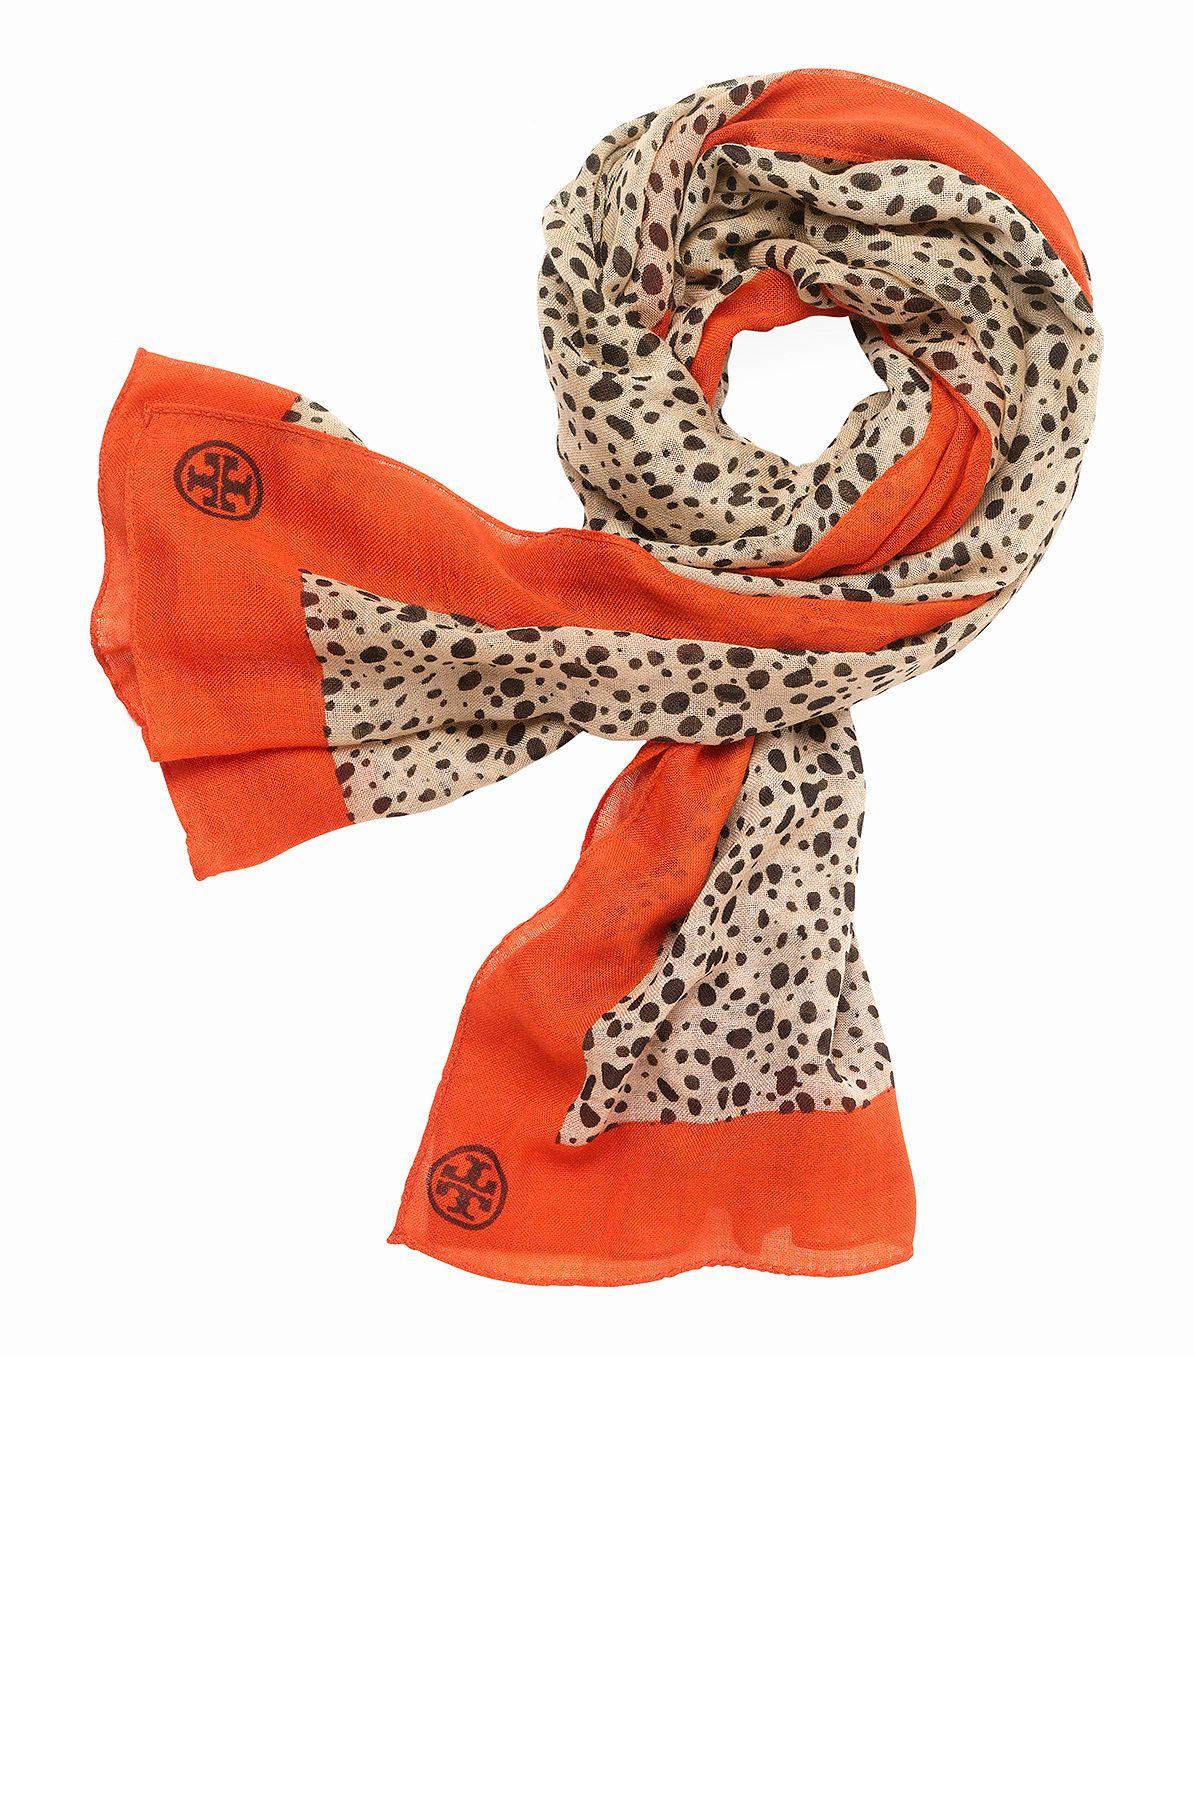 Tory Burch Cheetah Animal Print Scarf